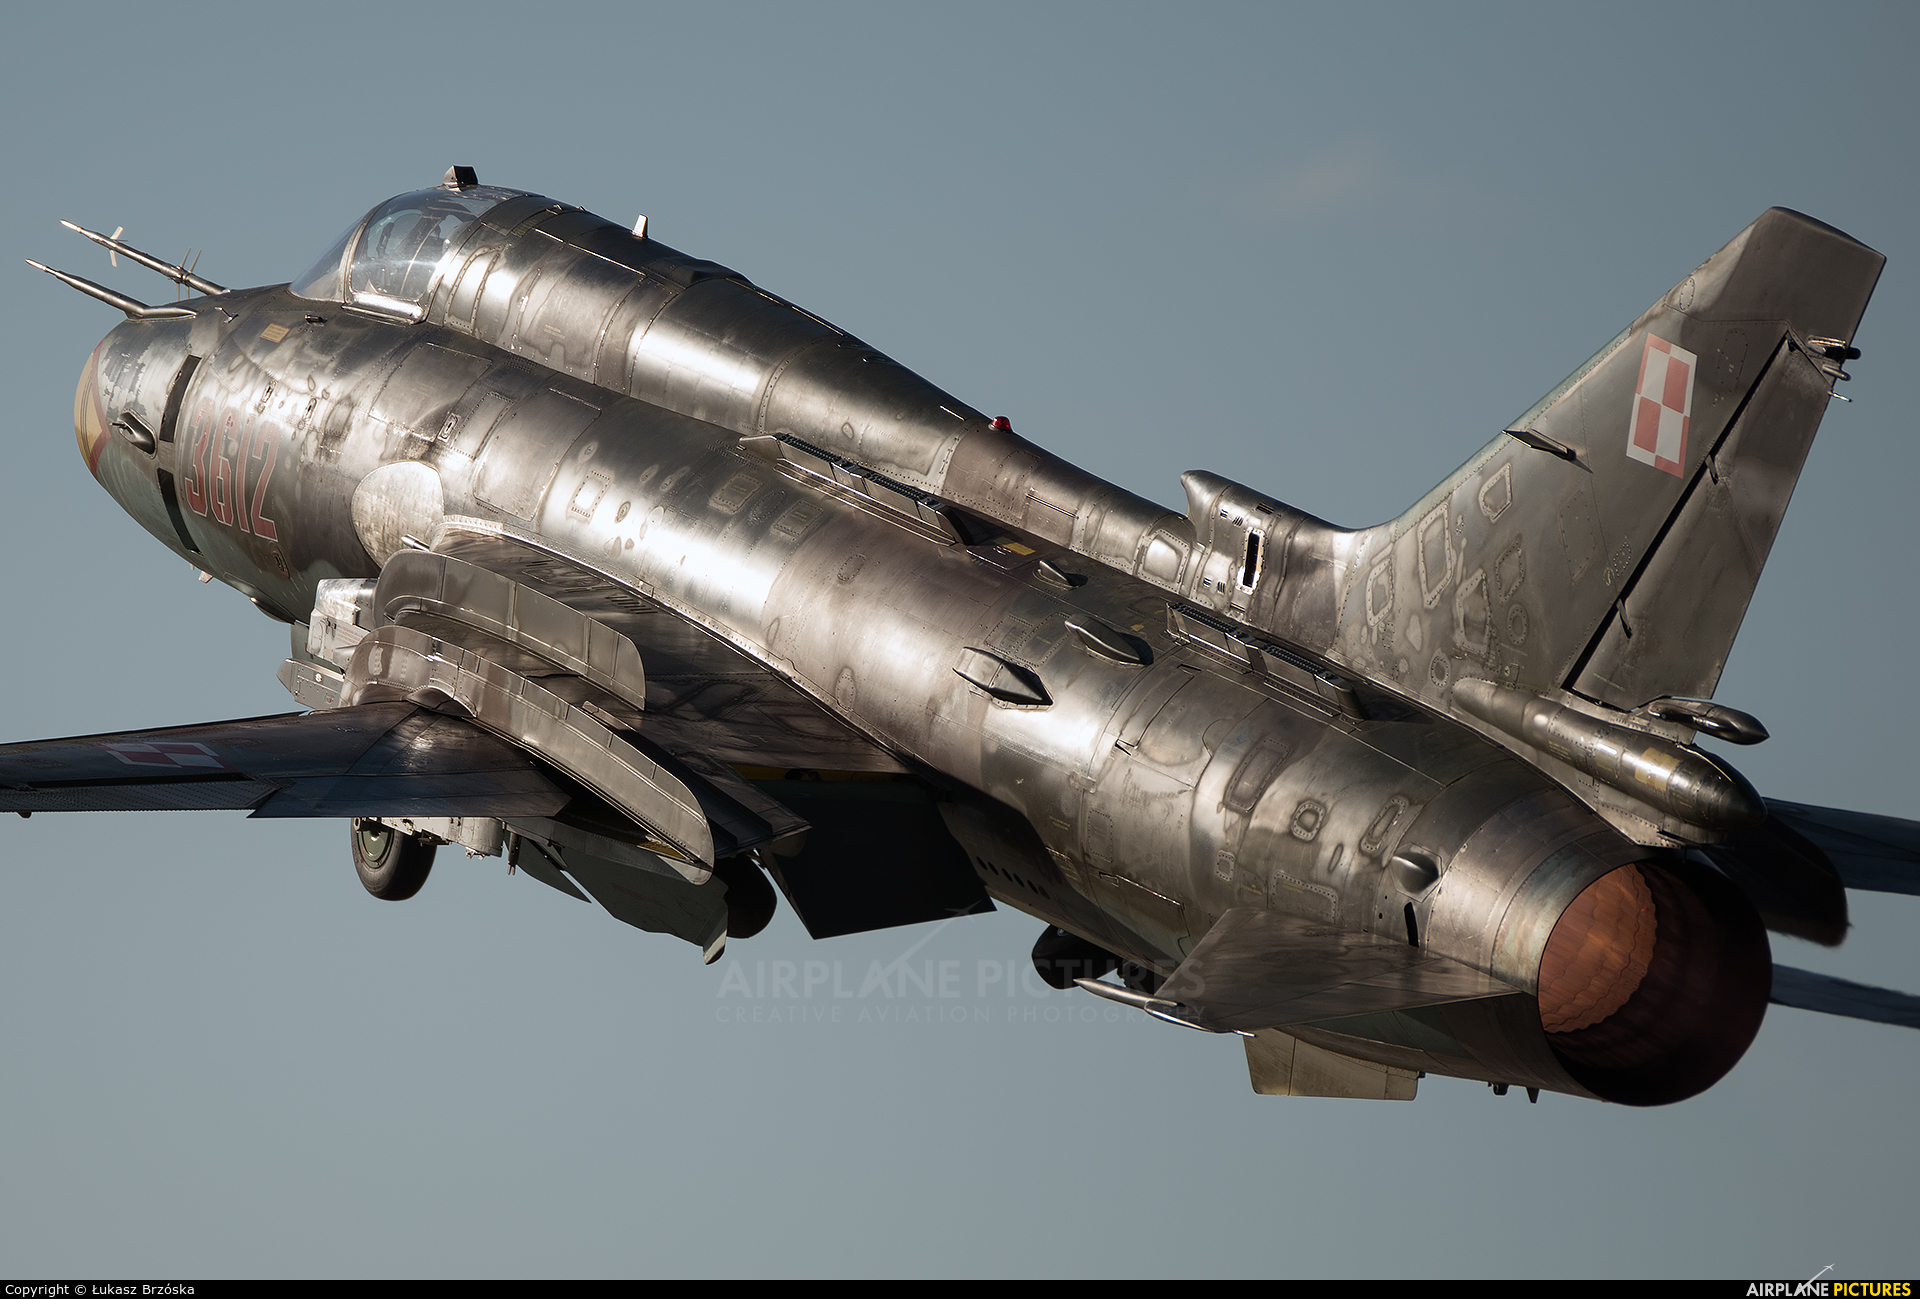 Poland - Air Force 3612 aircraft at Świdwin